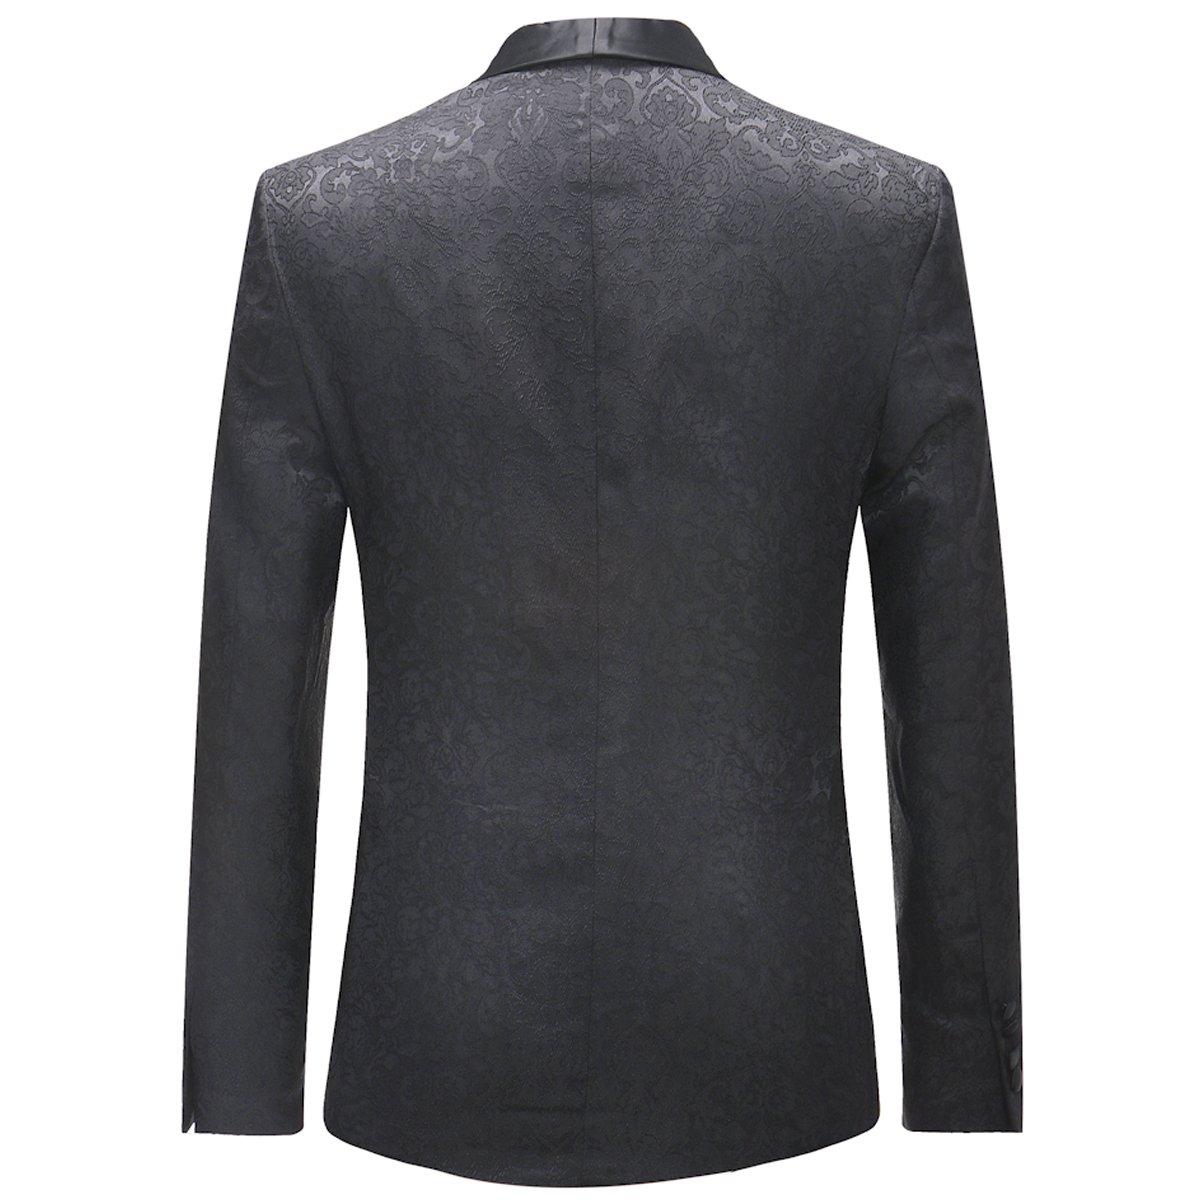 03986df9f4af4c Mens Suits 3 Pieces Slim Fit Wedding Business Suits Jacquard Shawl Lapel  Tuxedo Blazer Waistcoat Trousers: Amazon.co.uk: Clothing